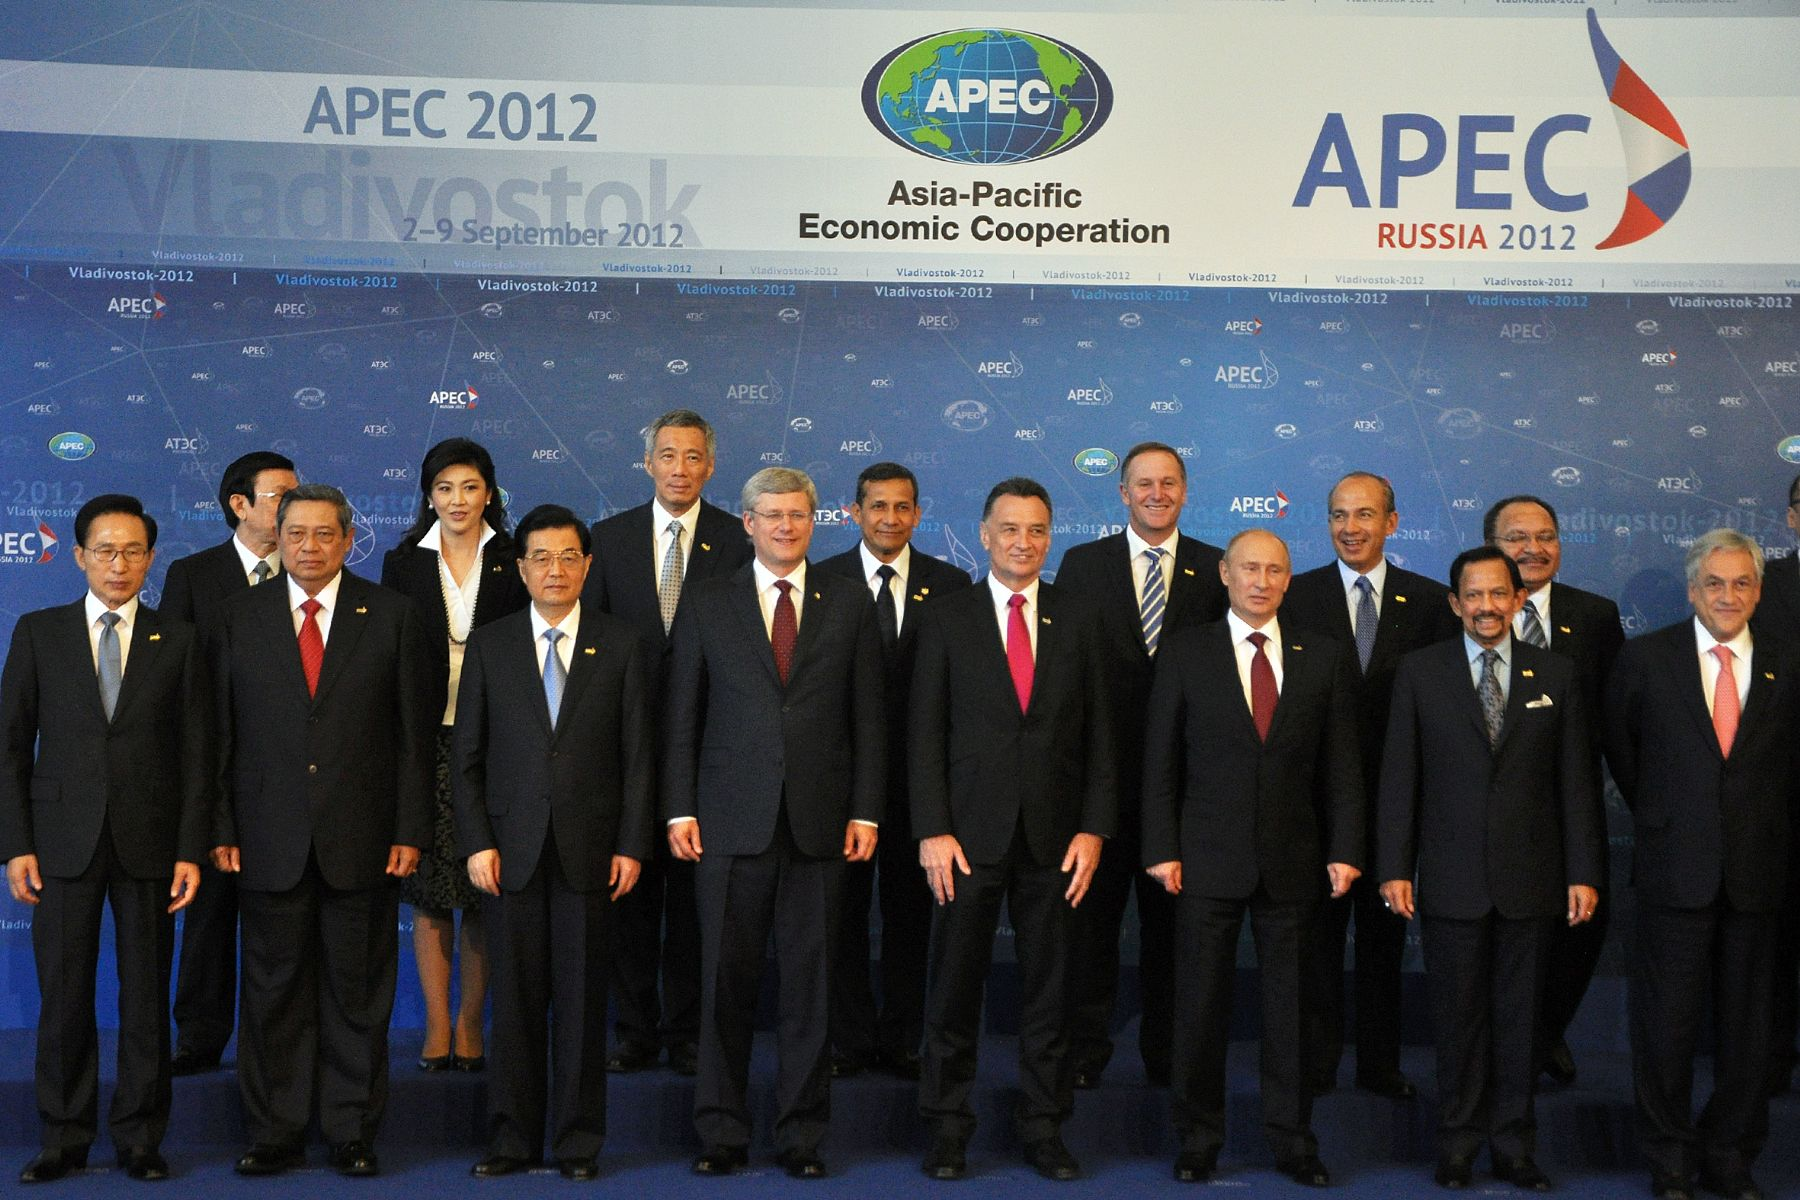 Líderes de APEC 2012. Foto: ANDINA/Prensa Presidencia.